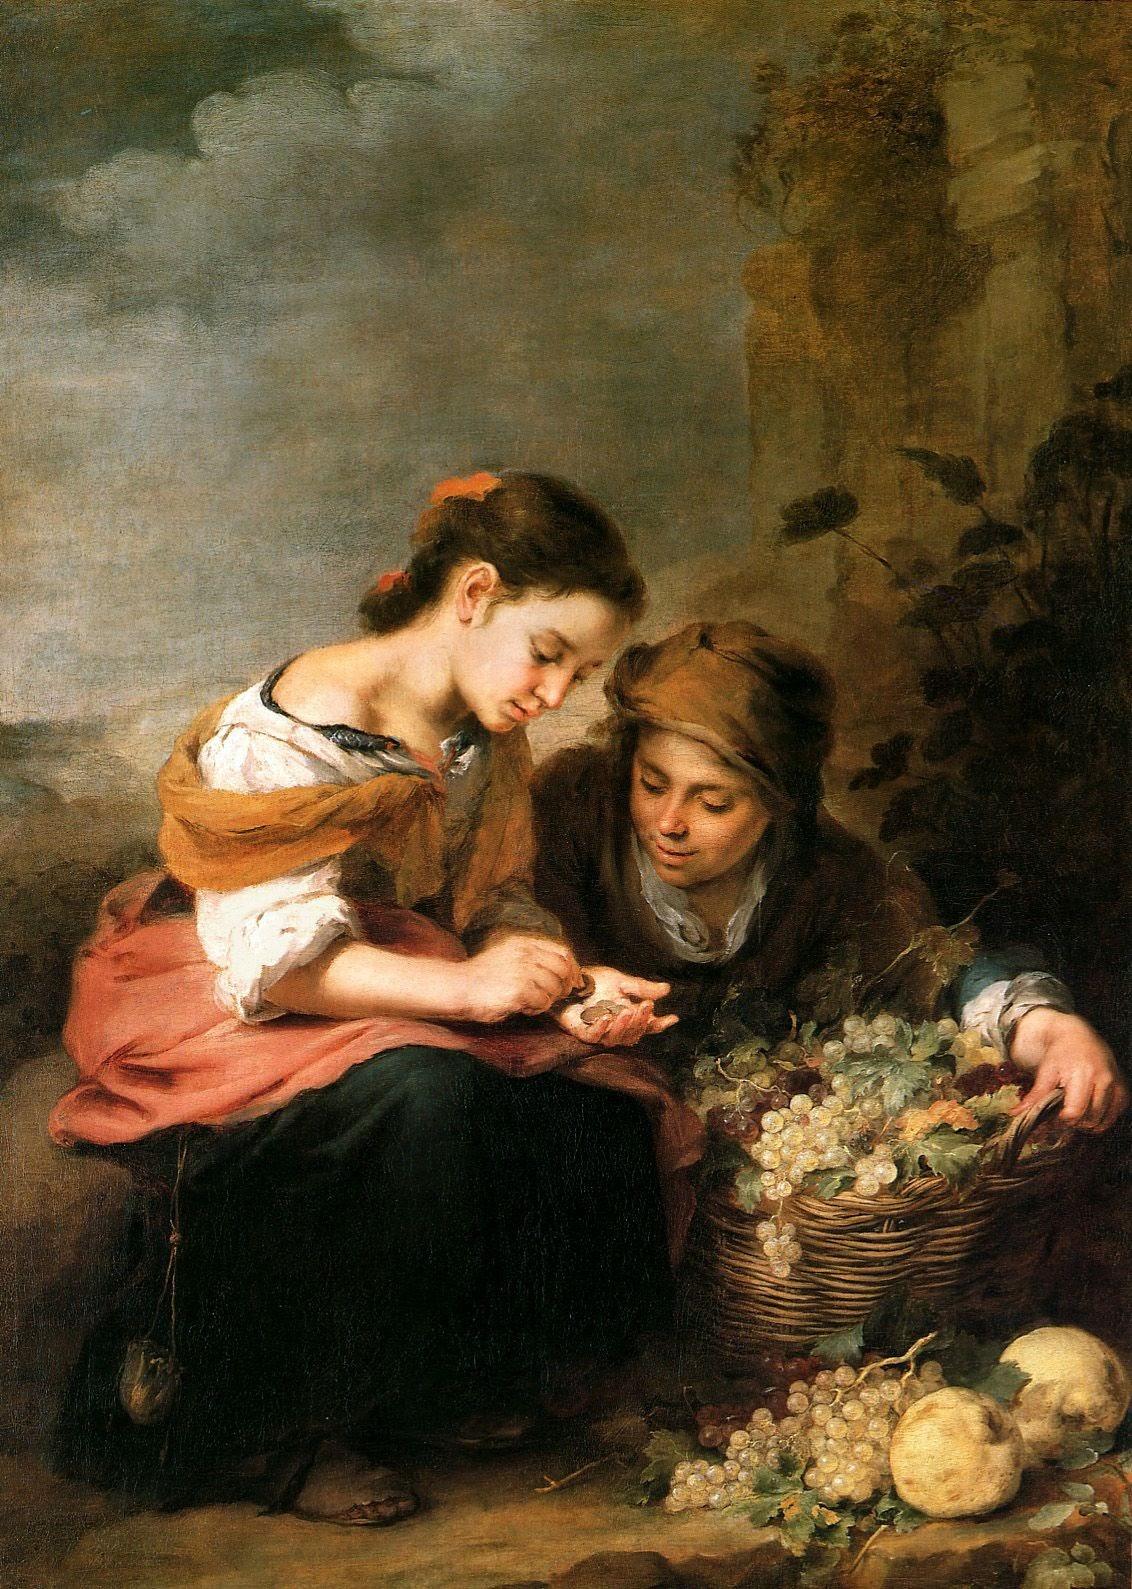 Bartolomé-Esteban-Murillo-The-Little-Fruit-Seller